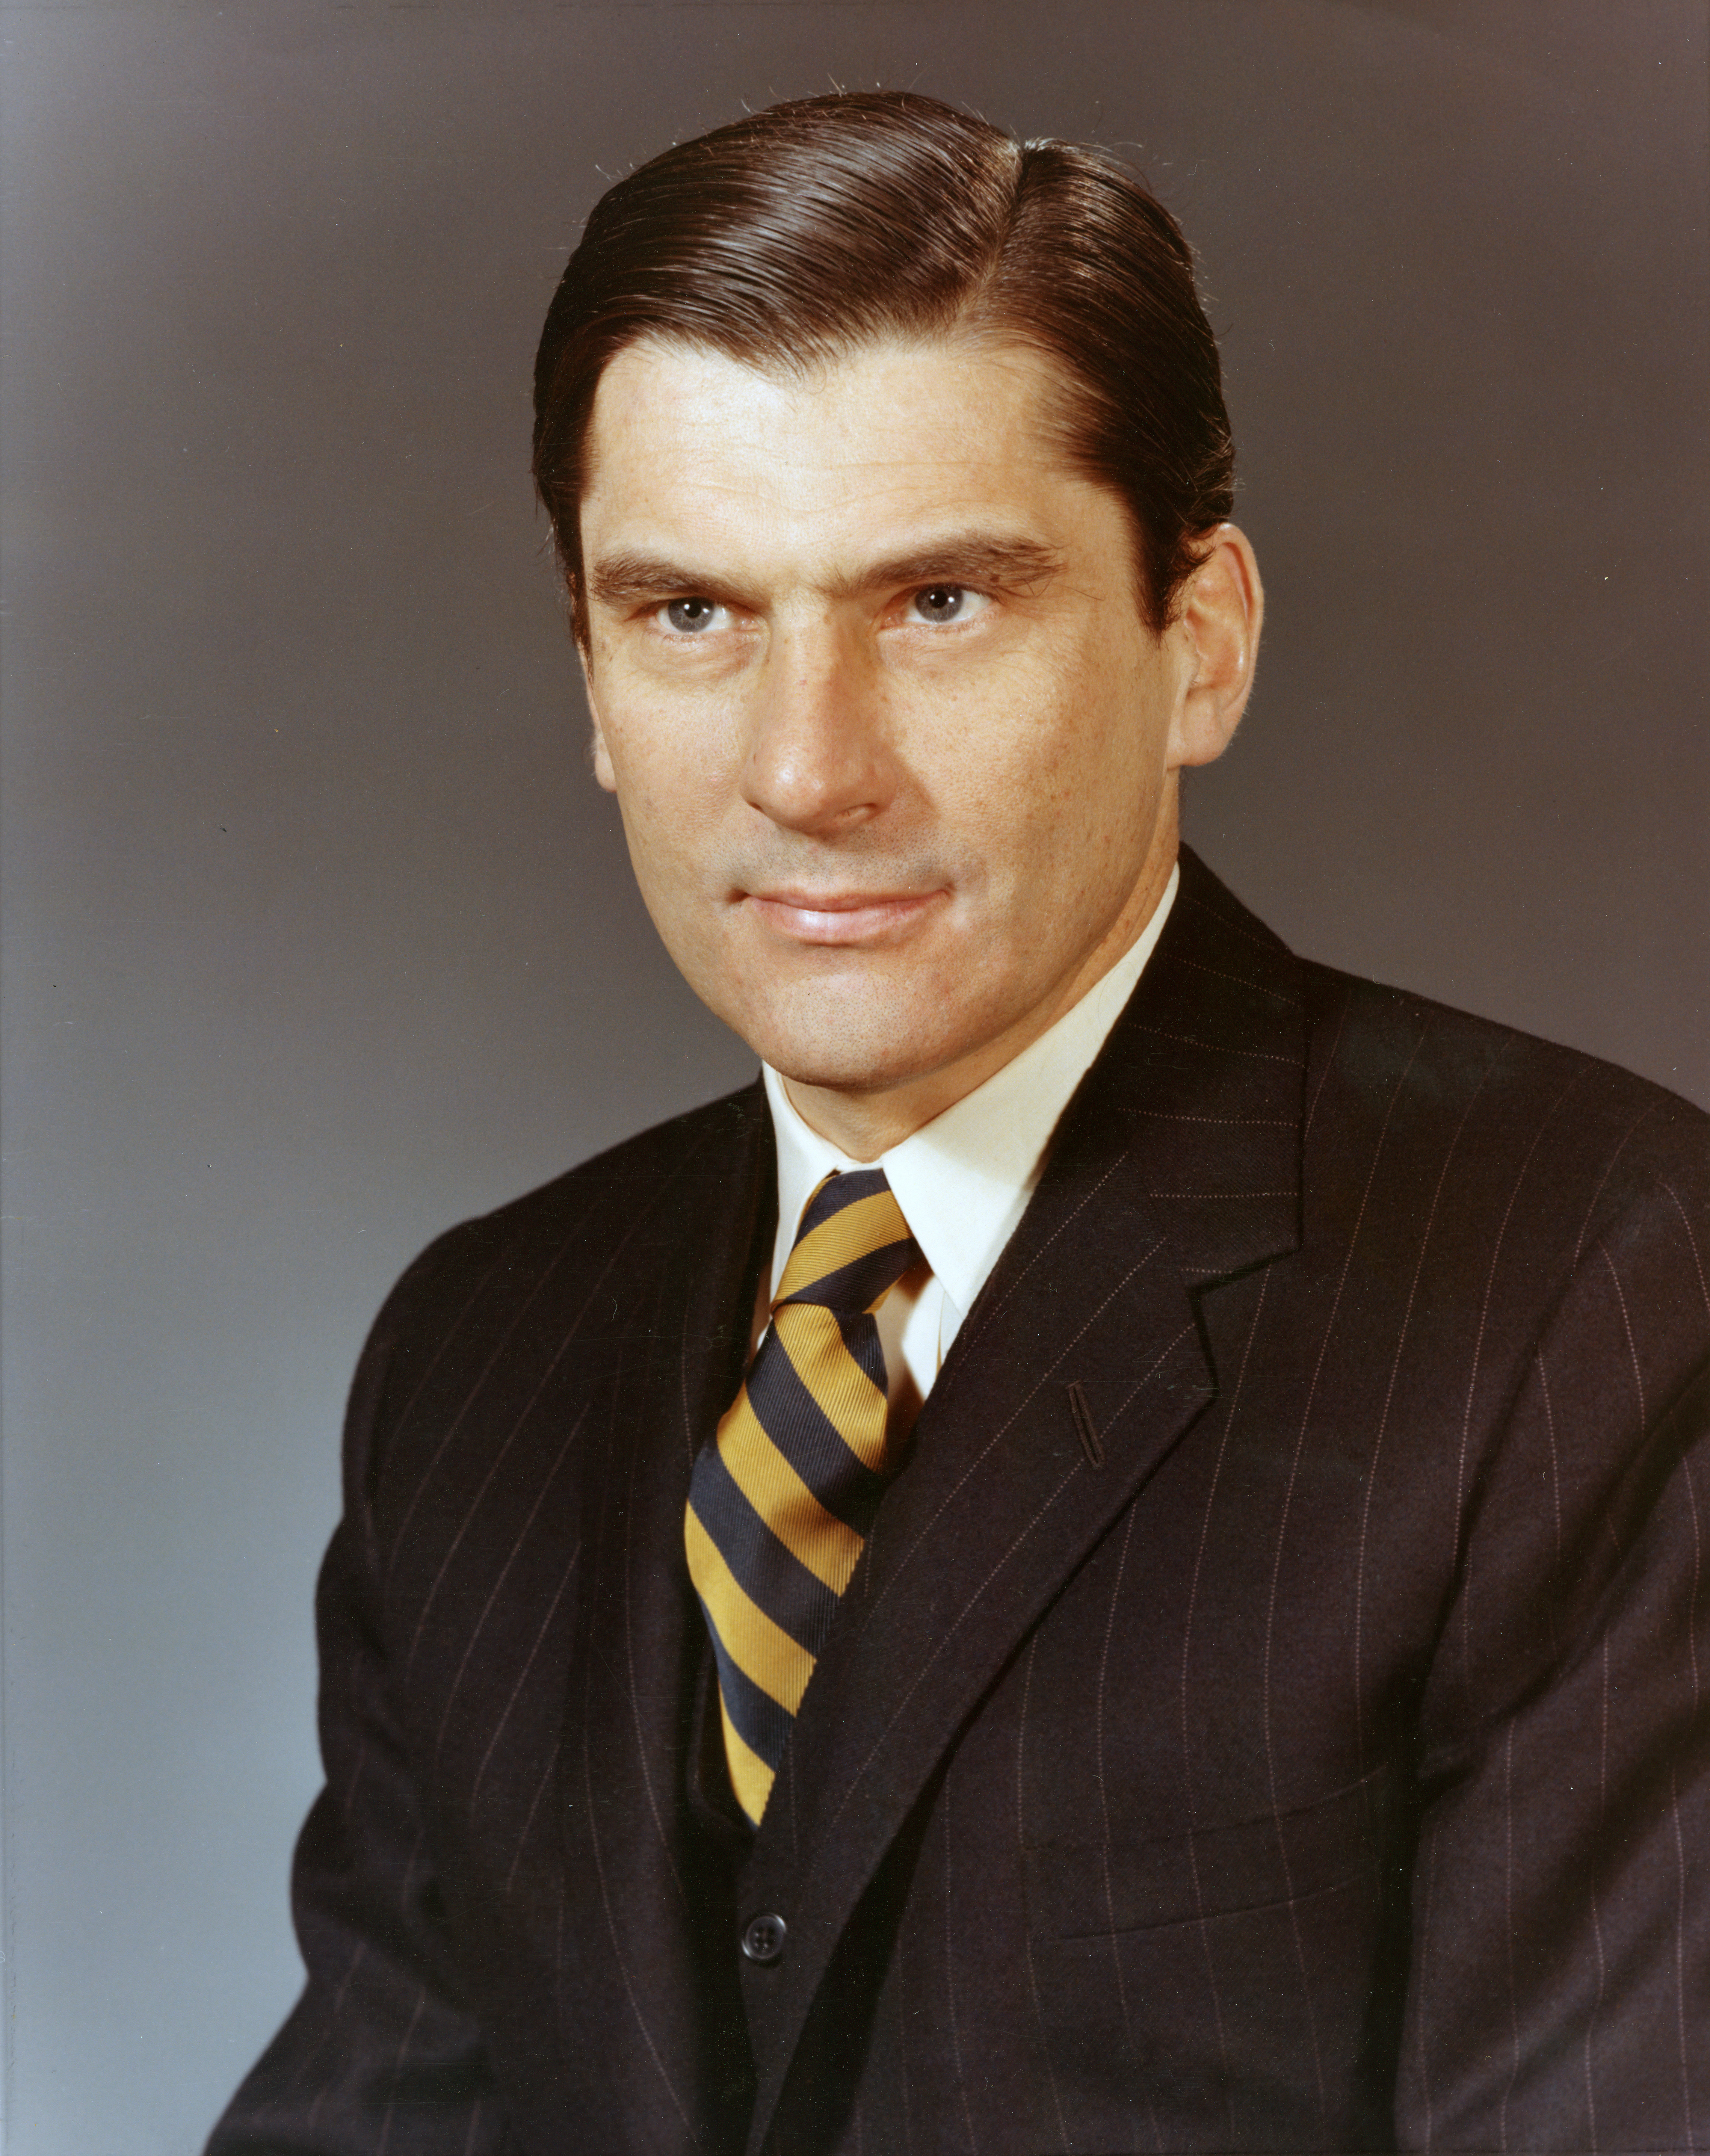 John W Warner Sec of Navy.jpg